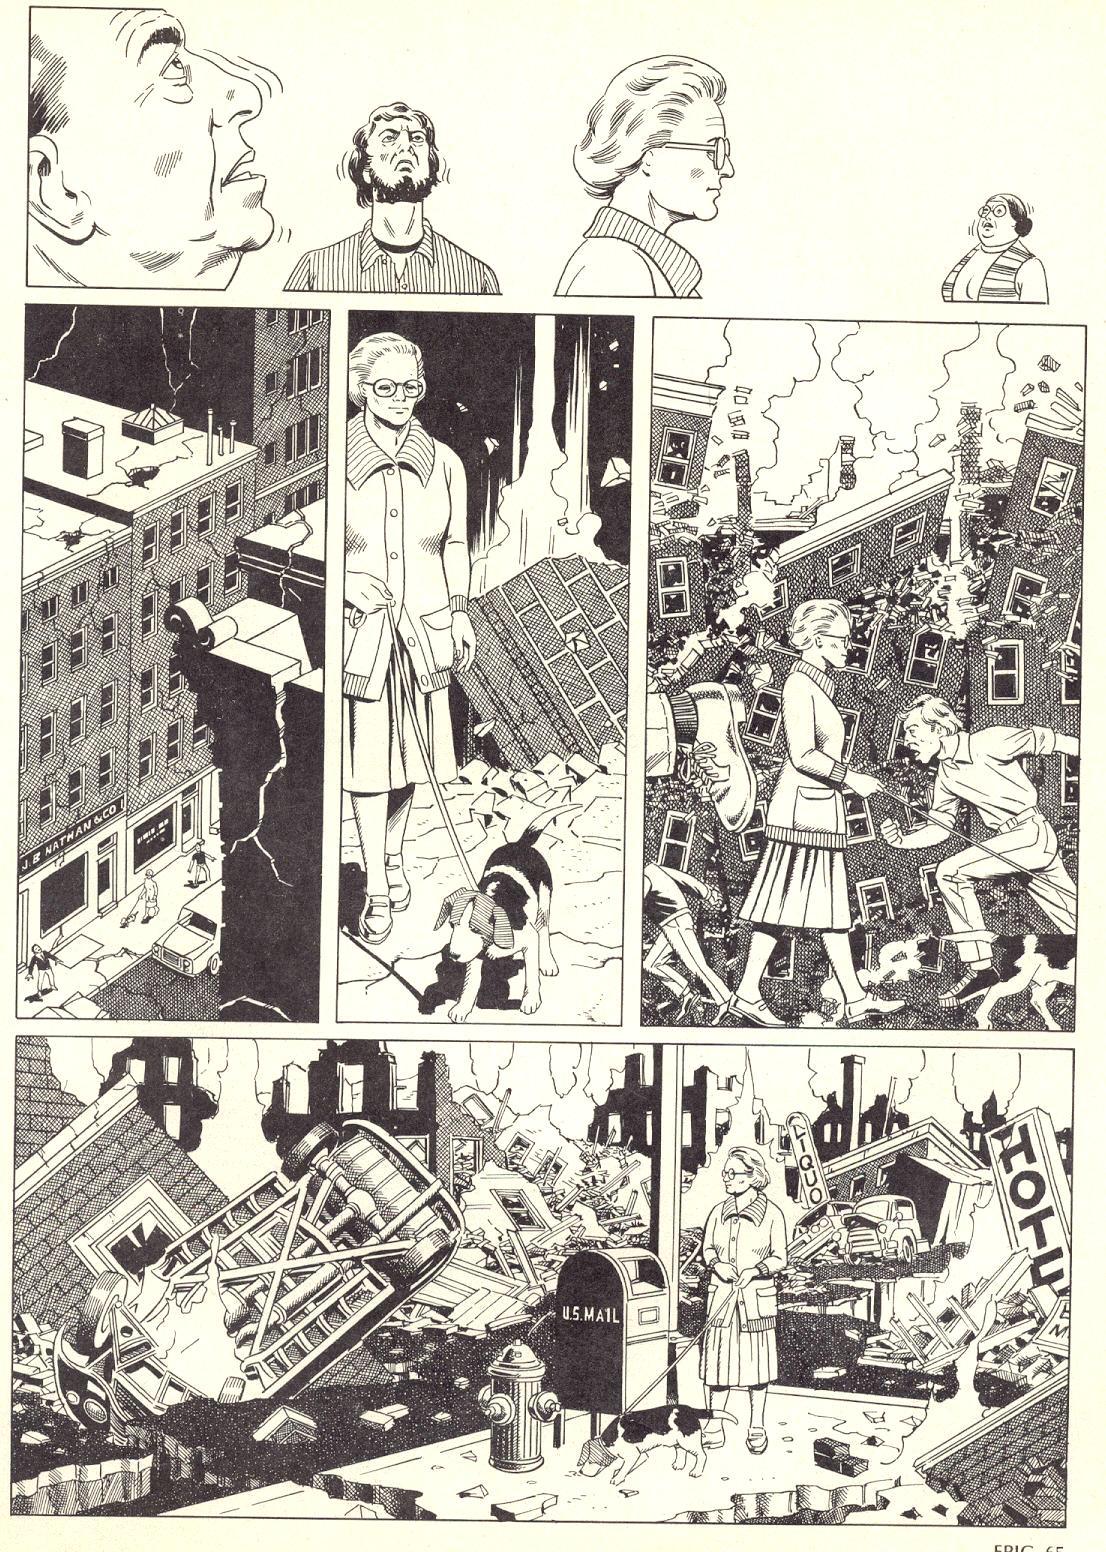 Epic Illustrated (1980) #4 Survivors pg2.